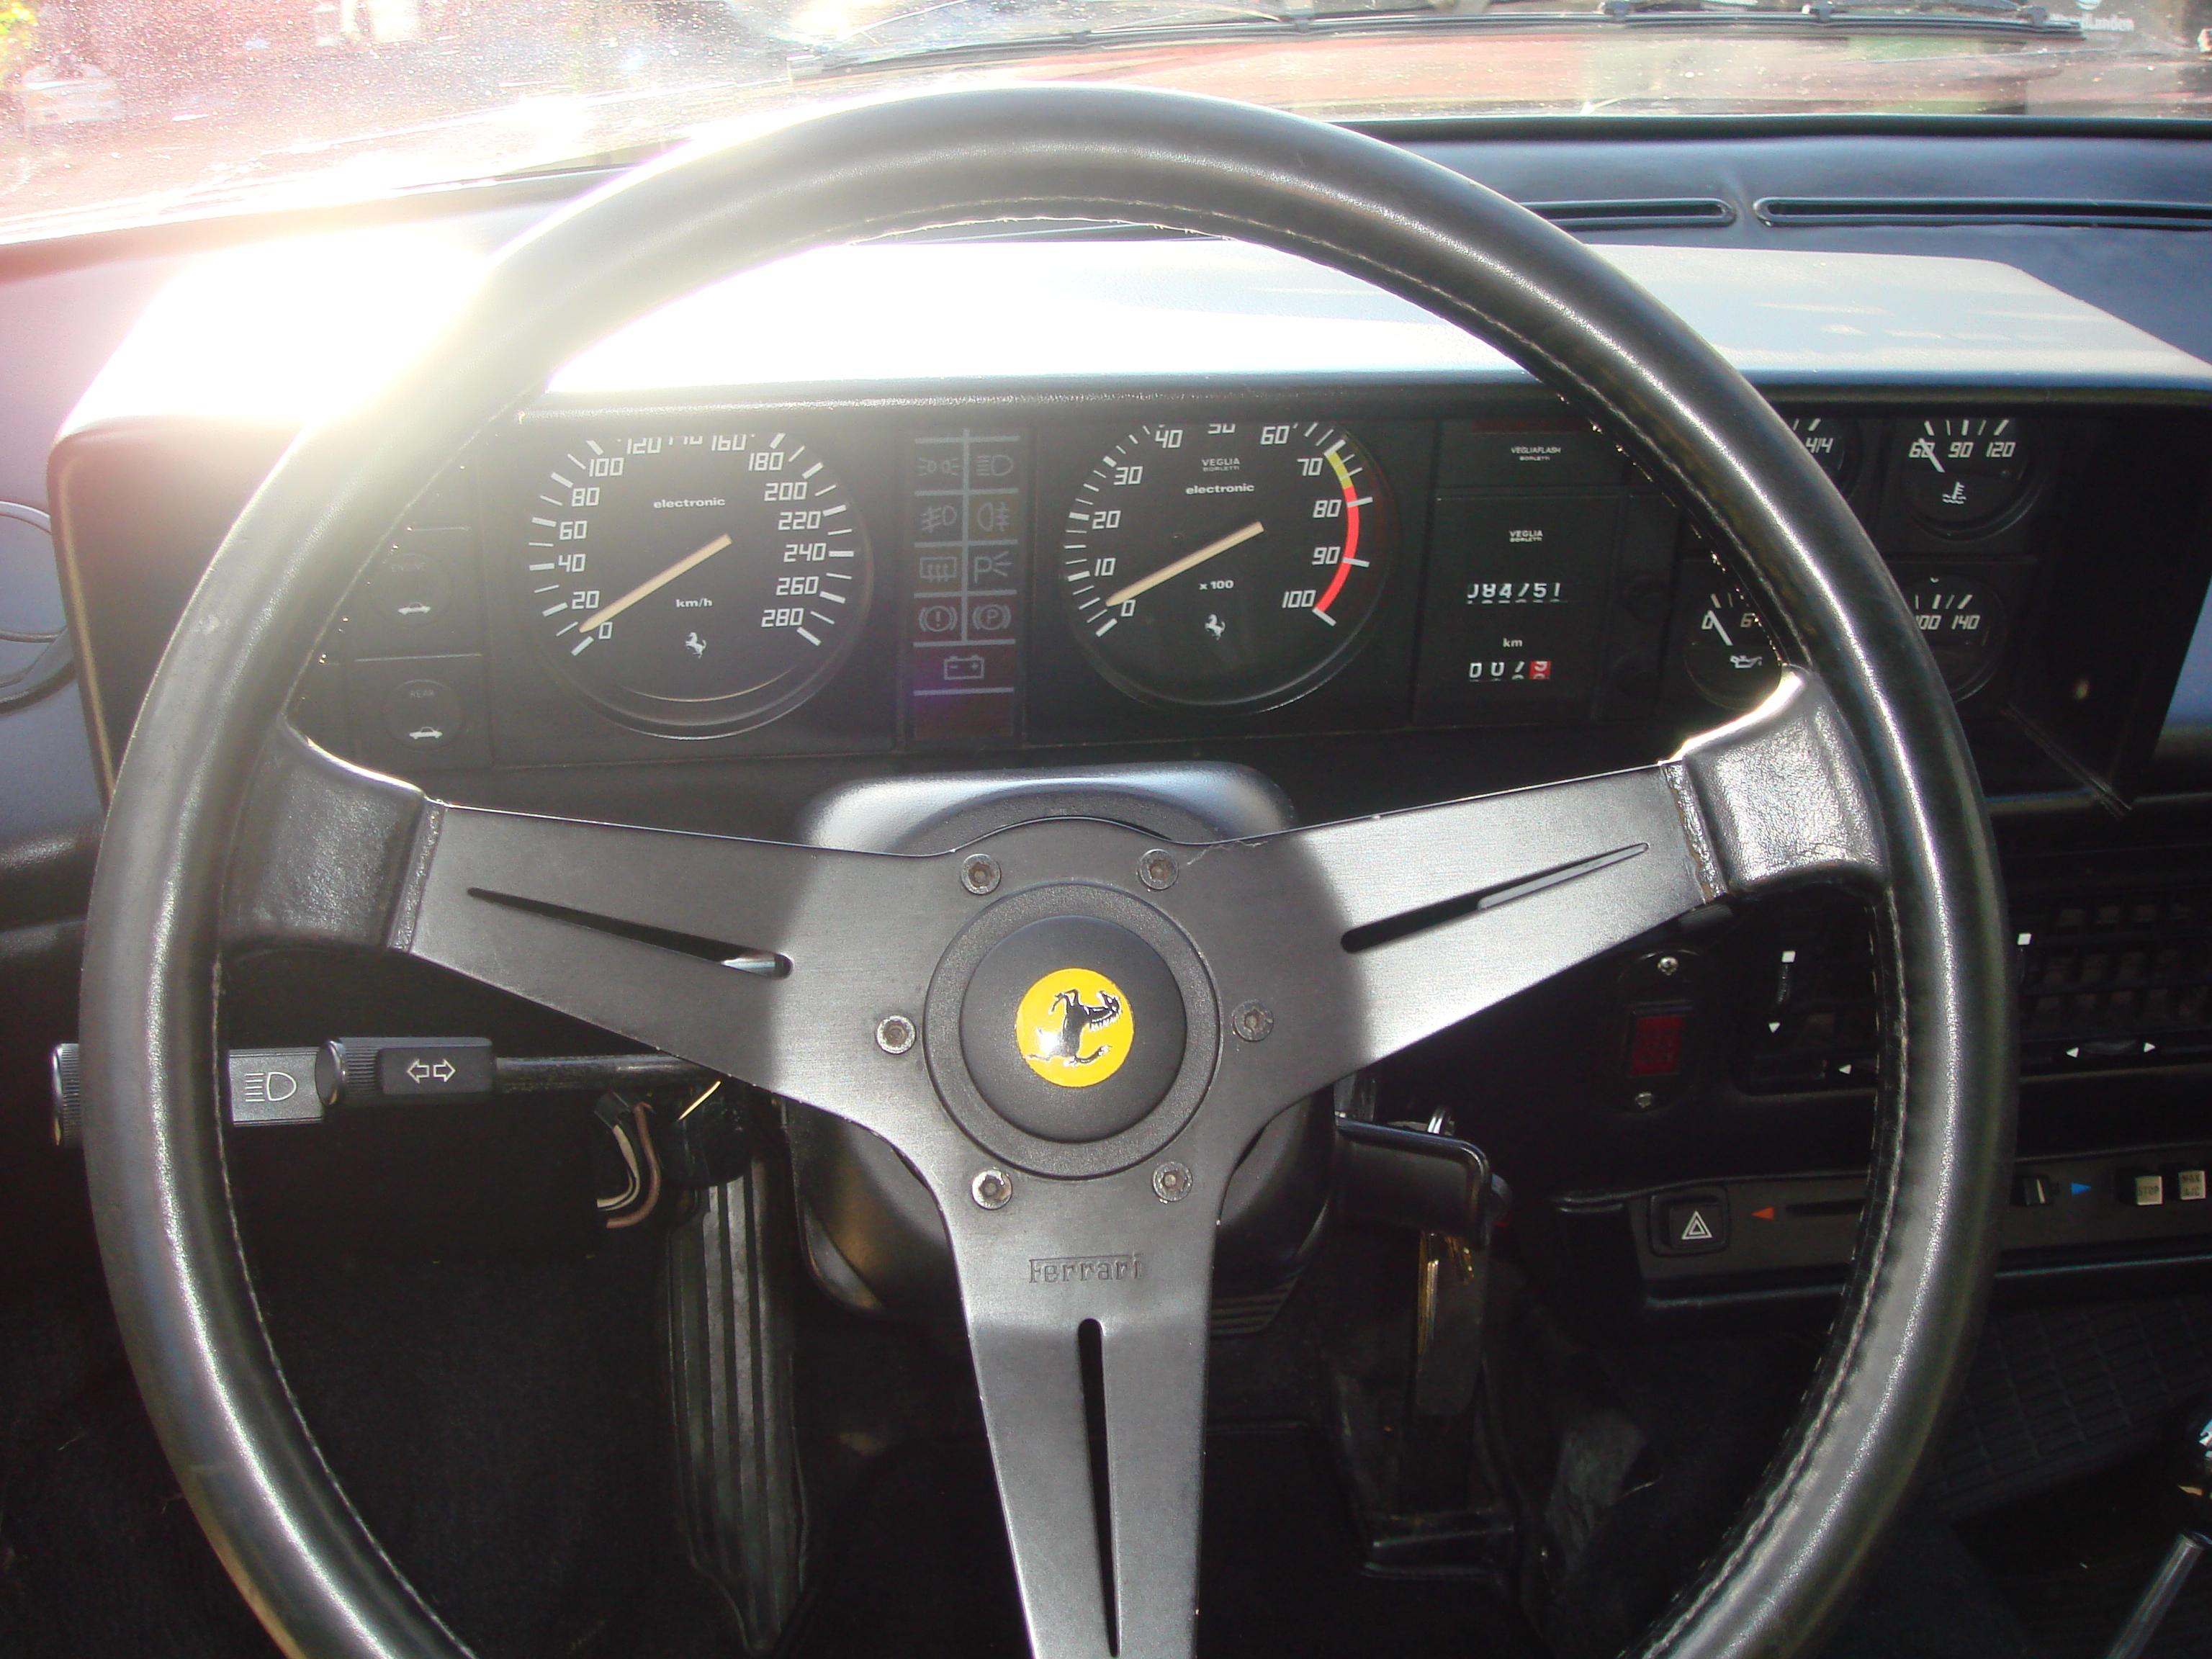 Goedkoopste-Ferrari-7 Marvelous Ferrari Mondial 8 Te Koop Cars Trend